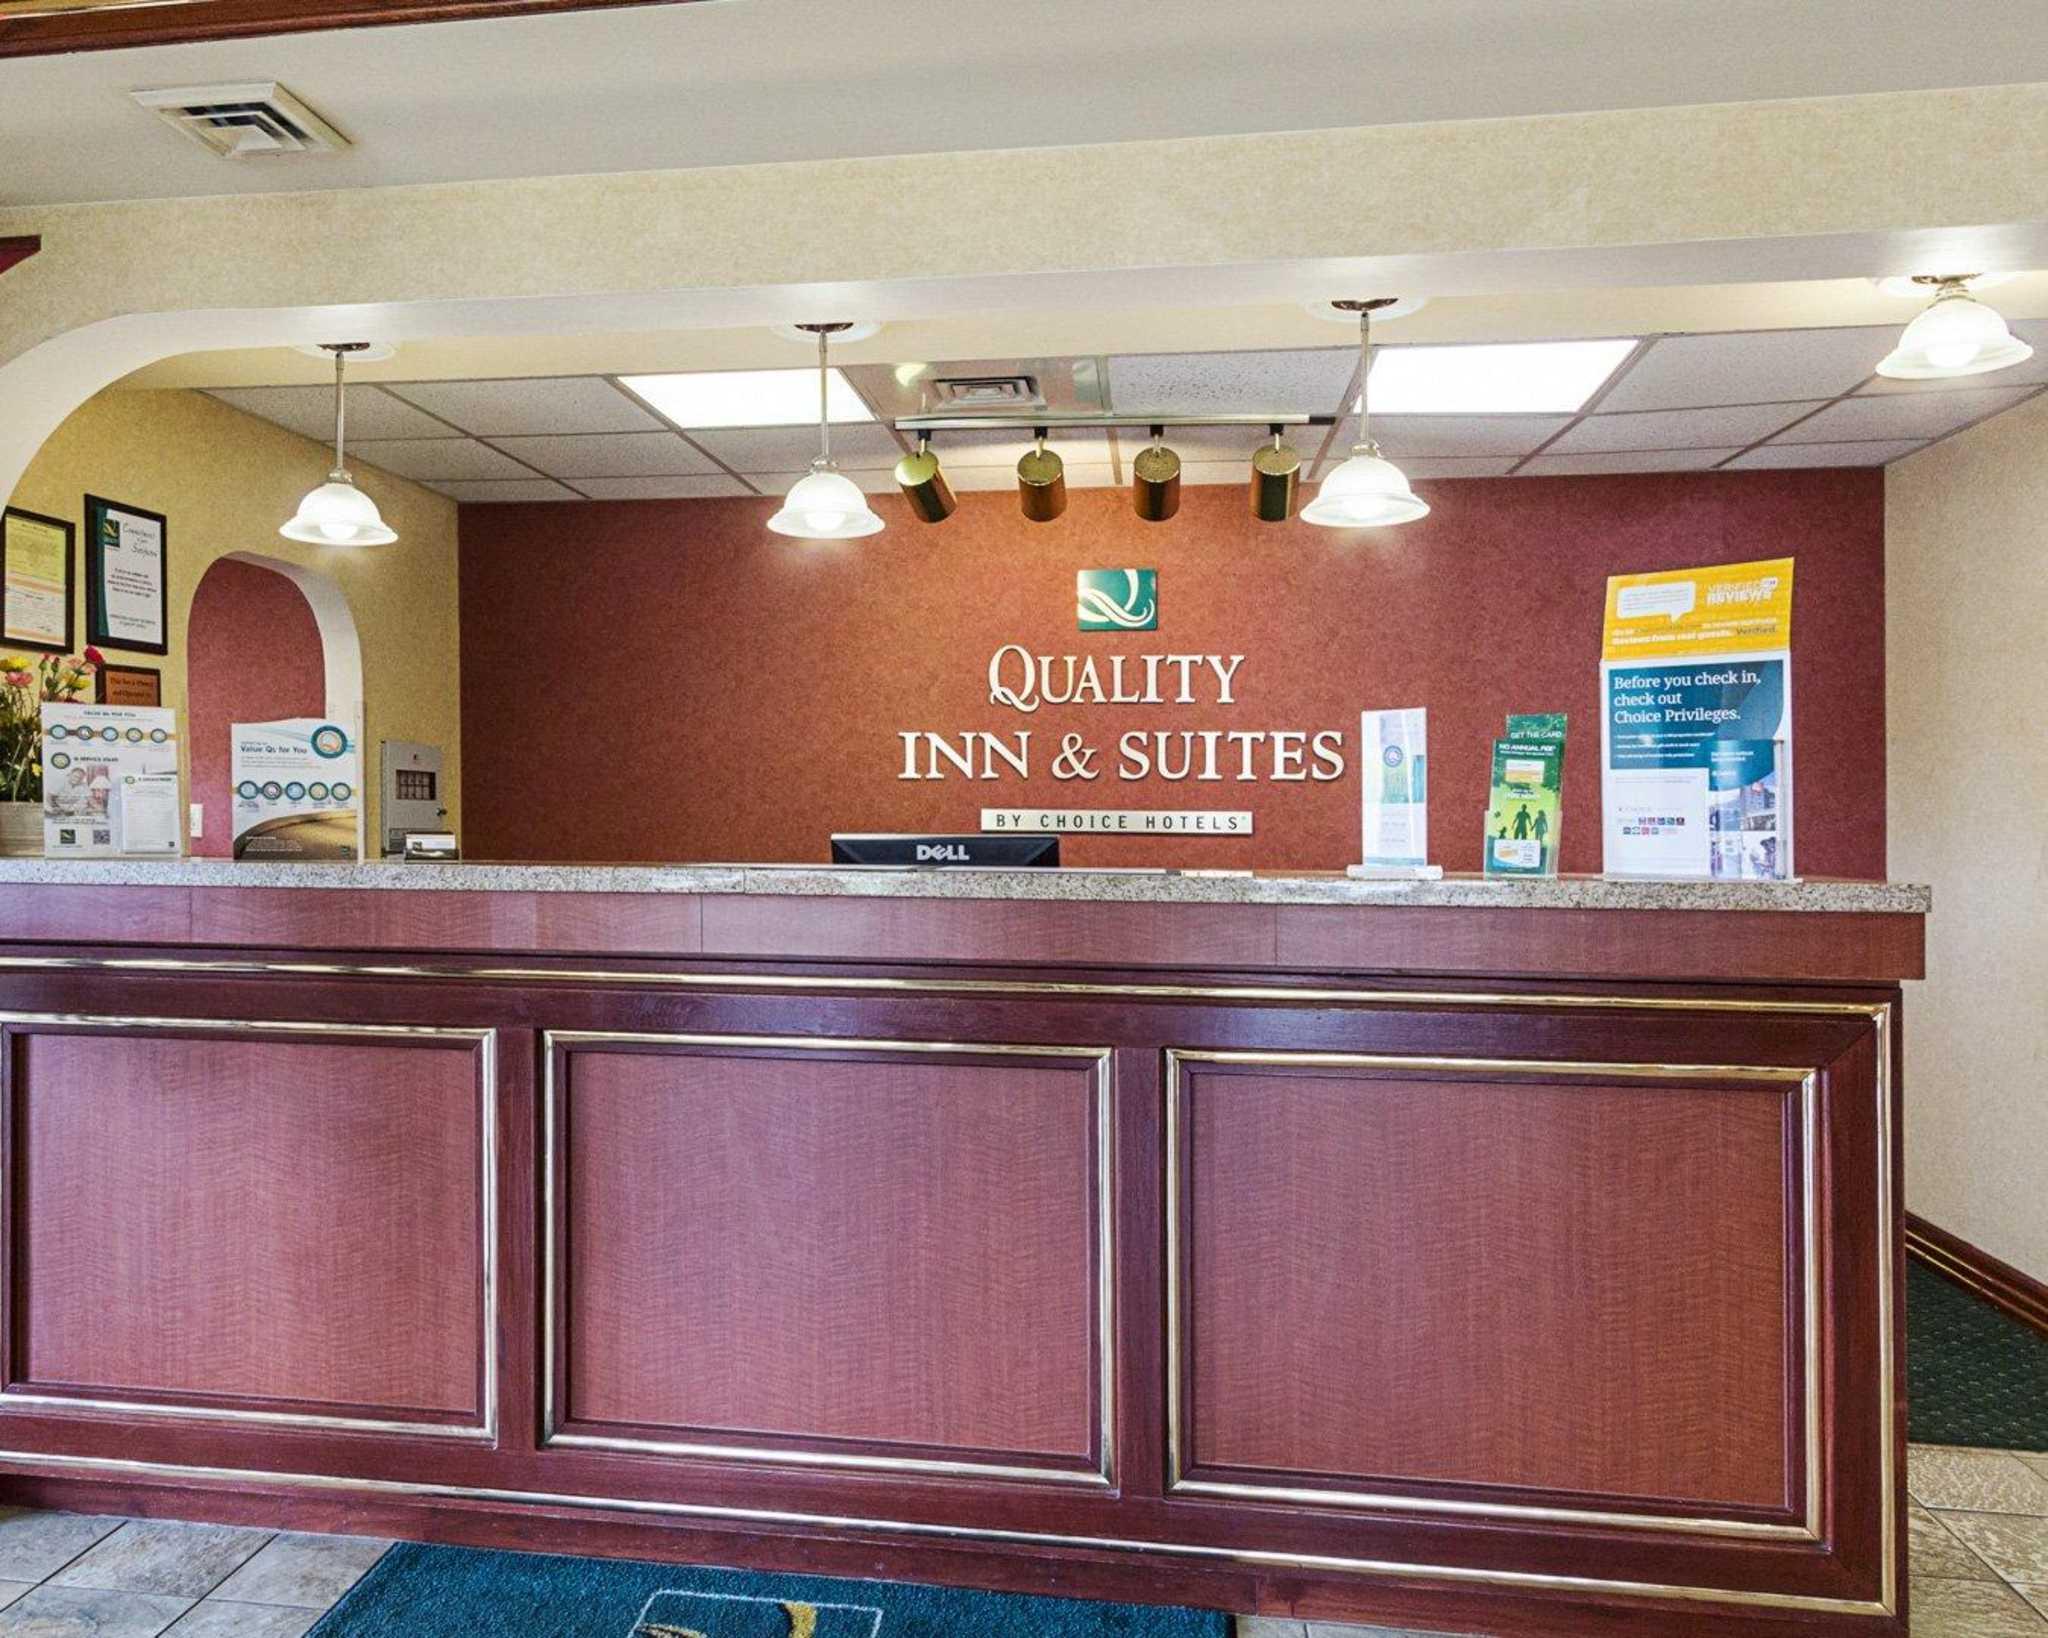 Quality Inn & Suites Southwest image 20